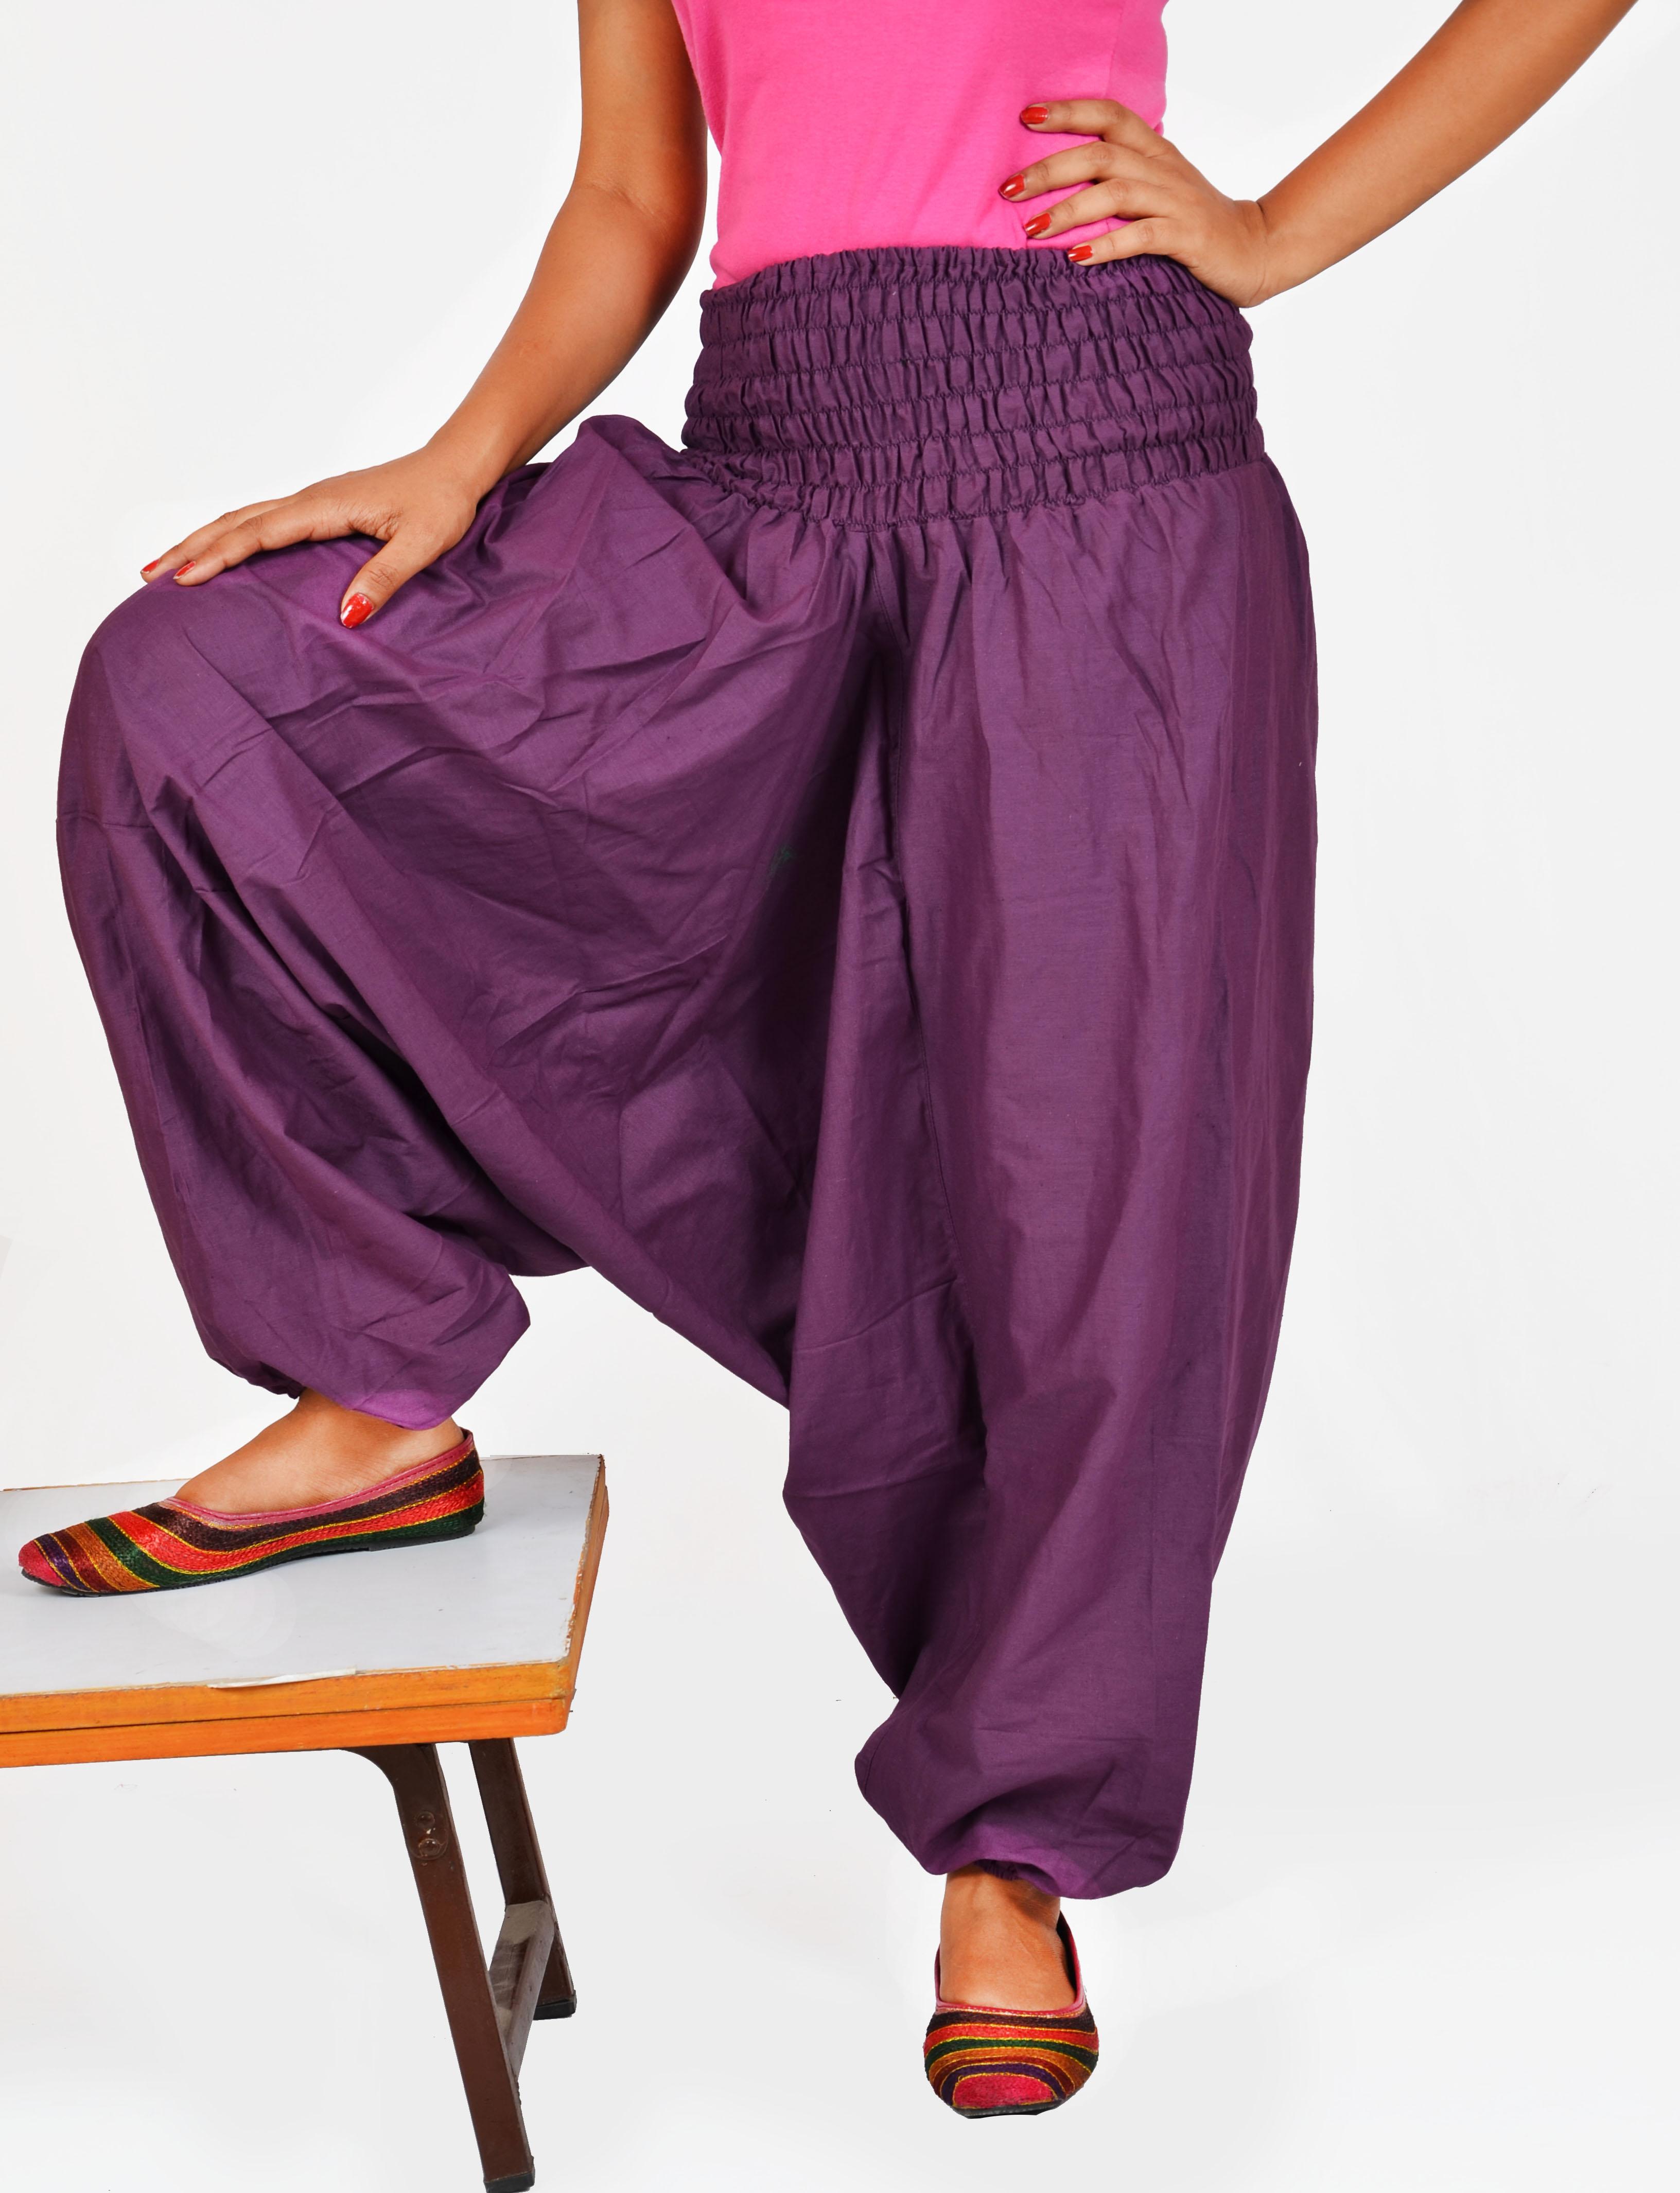 Indian Women's Girl's Burgundy Color Cotton Harem Pants Trouser